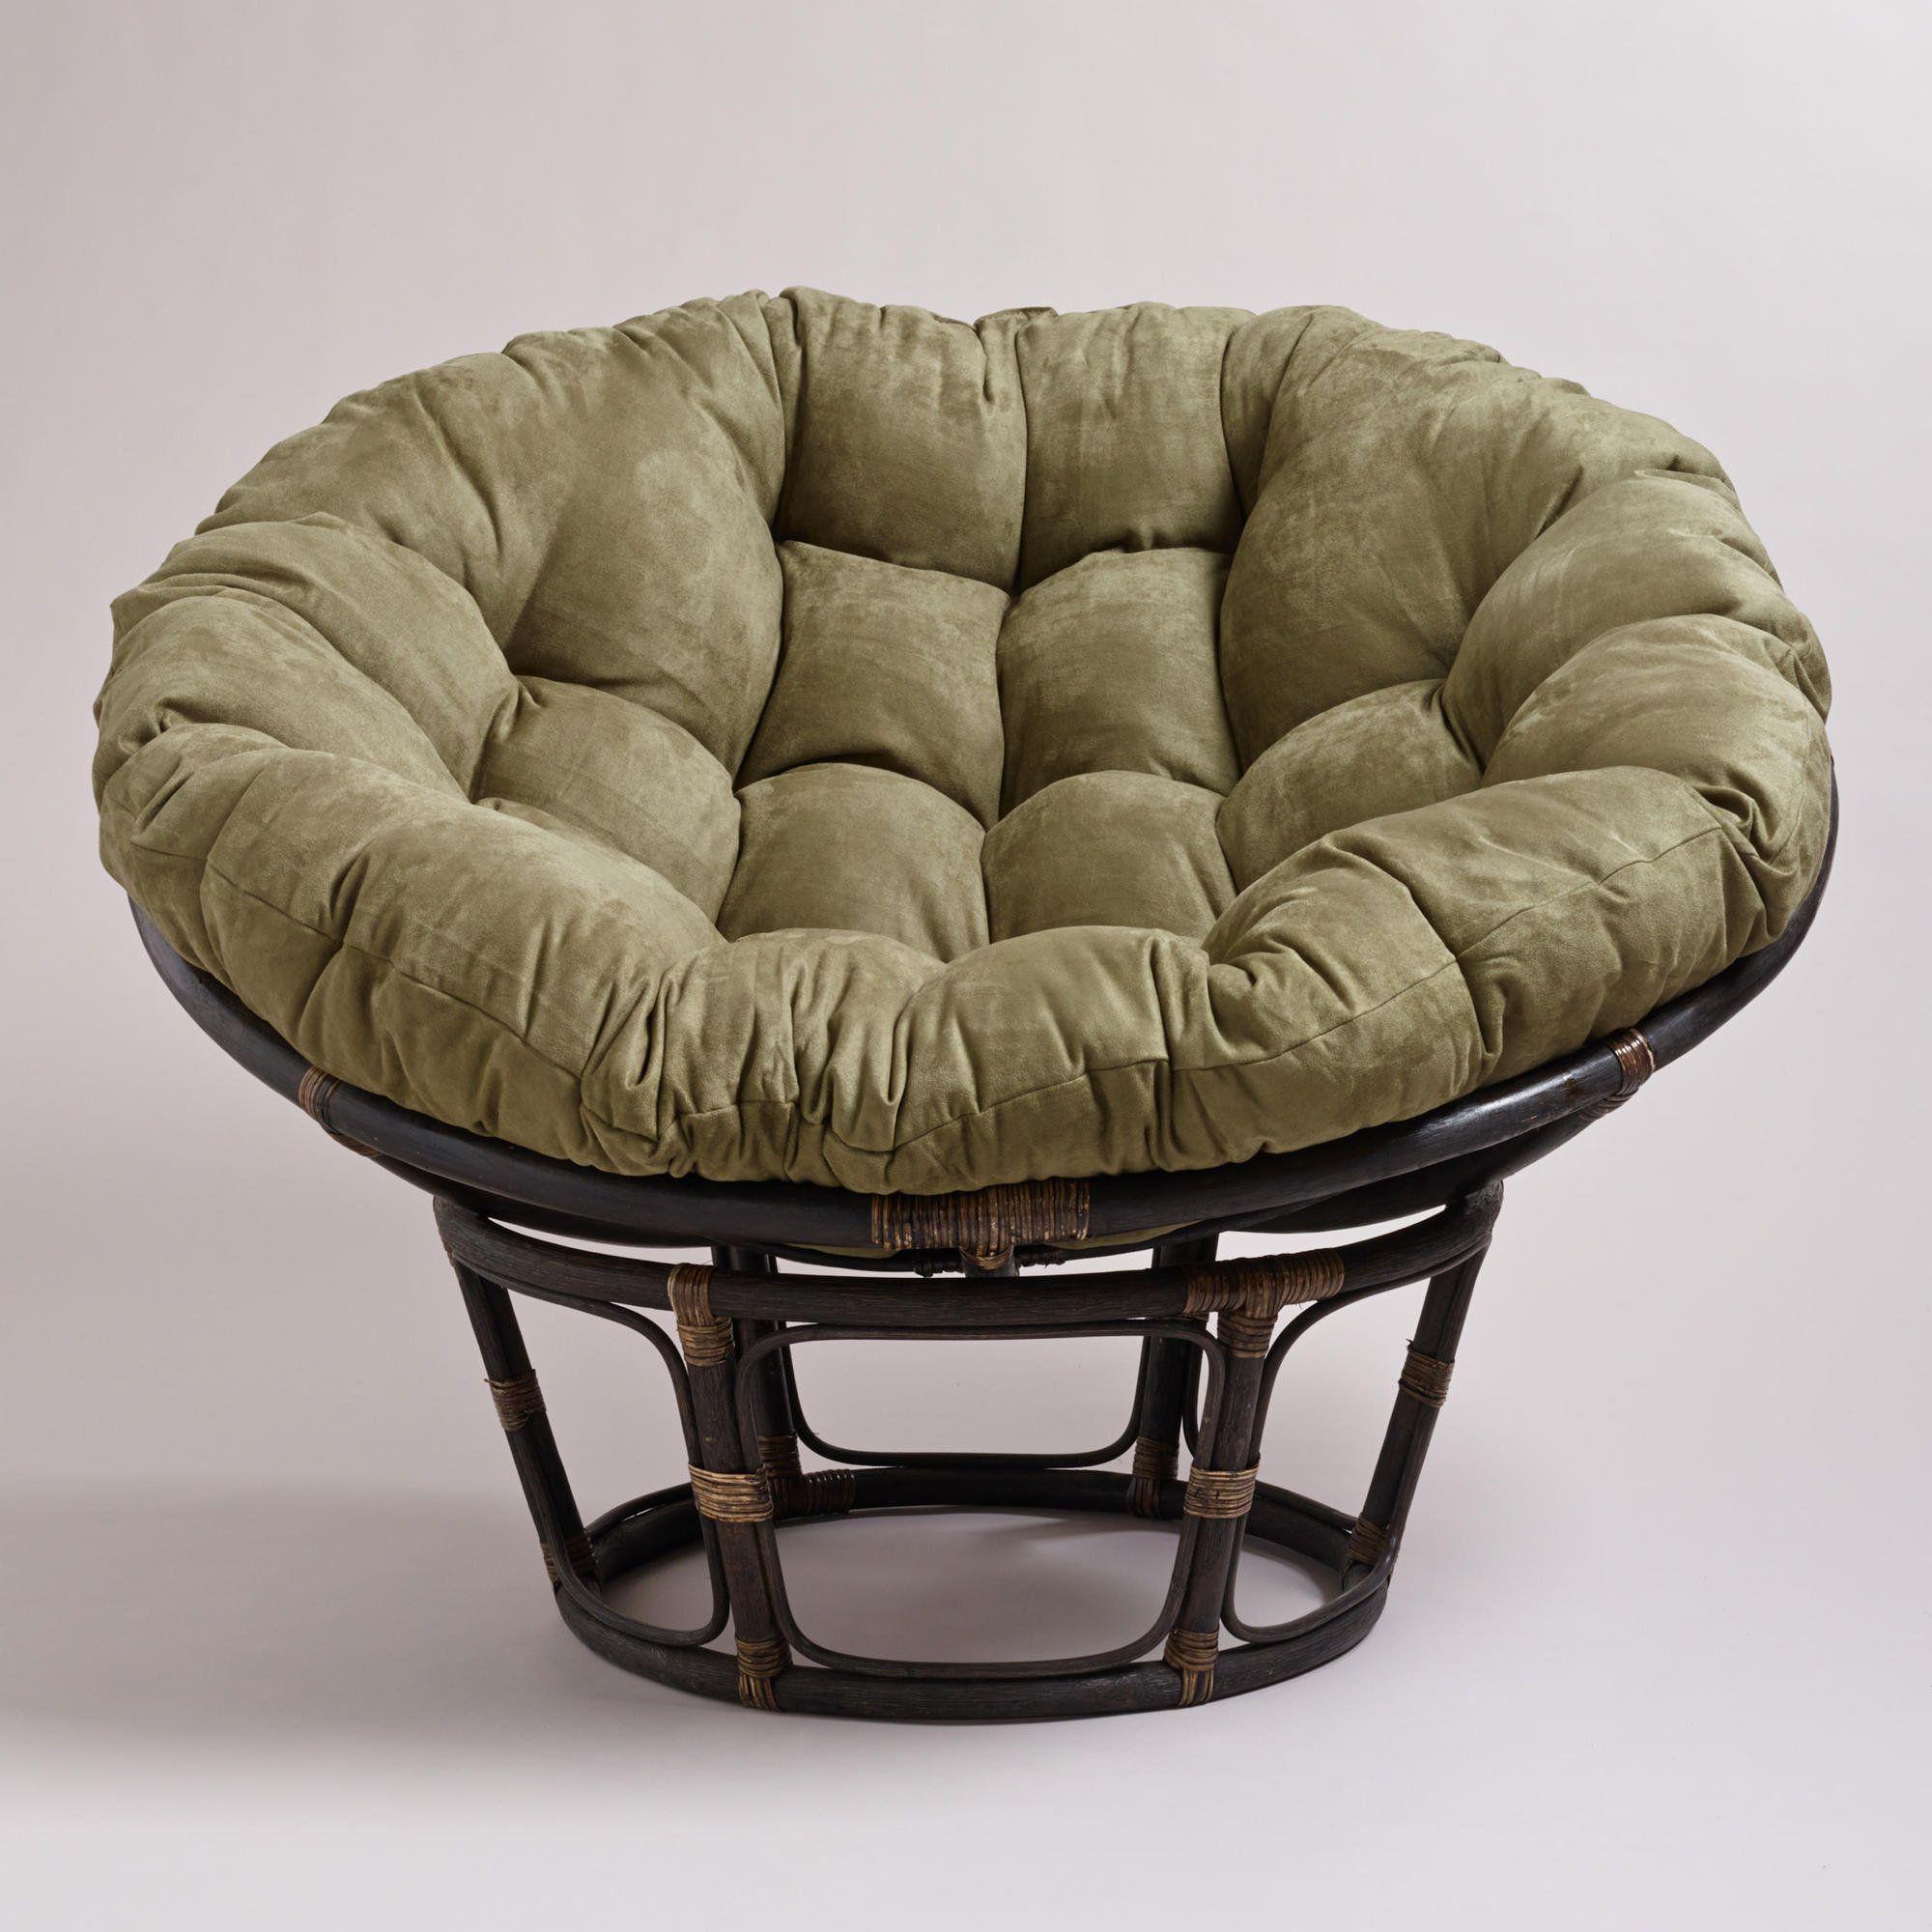 Olive Microsuede Papasan Chair Cushion For Jillian Xo